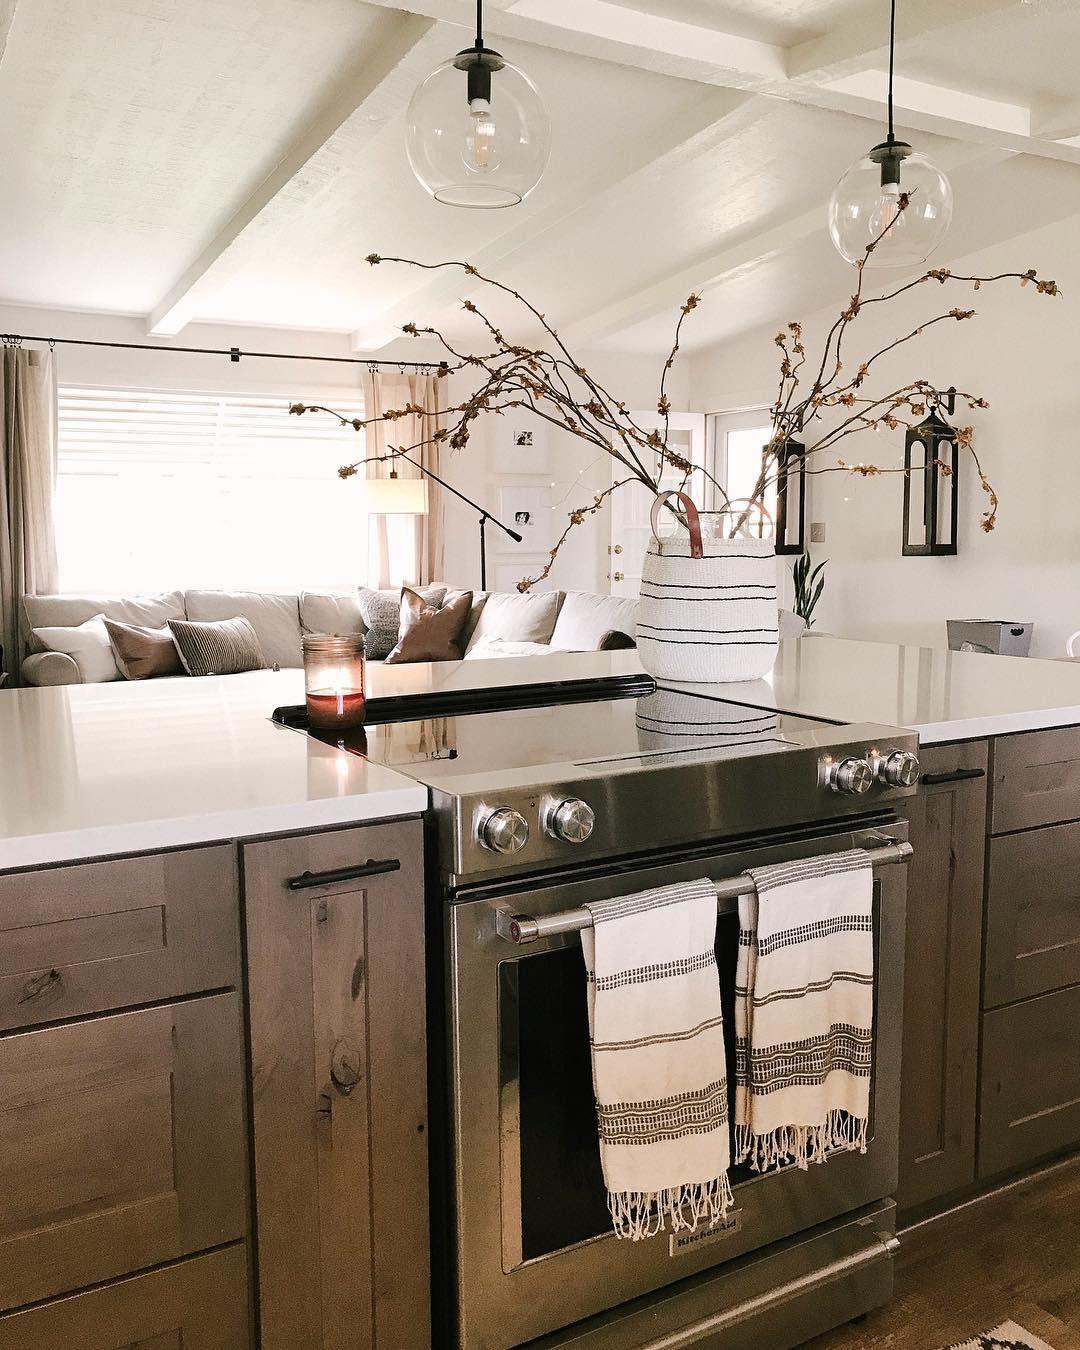 Utahrealestate Com Wfr Multiple Listing Service Searches Grey Kitchen Walls Home Decor Kitchen Home Kitchens